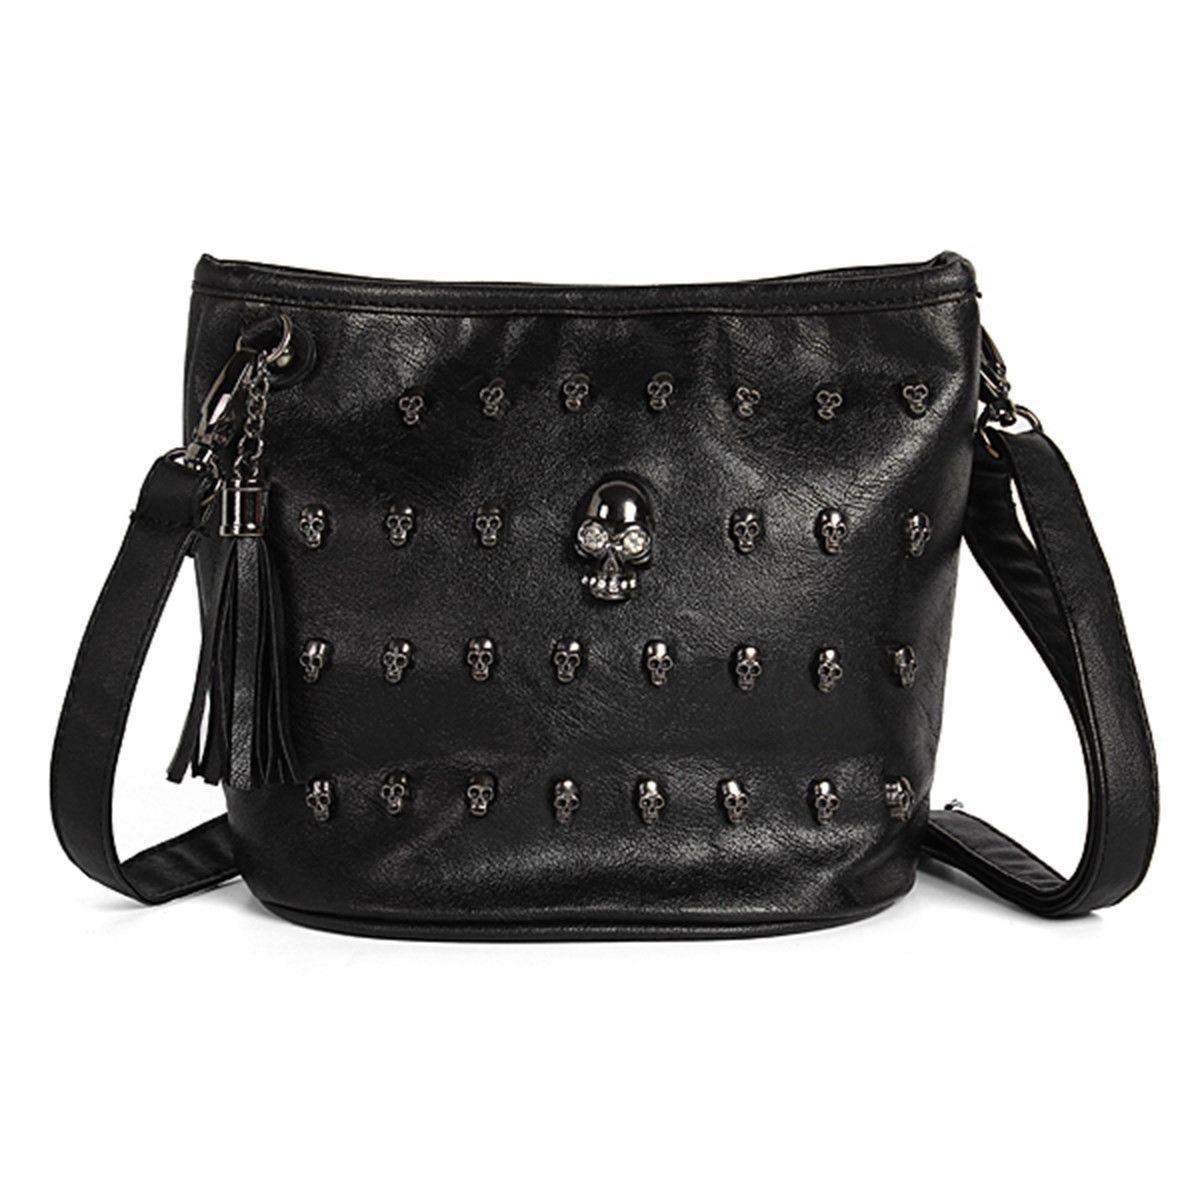 New Fashion Women Shoulder Bag Skull Face Studs Punk Rivet Lady Messenger PU  Leather Goth Coressbaby Bags Tassels Vintage Style  bag  handbags  kids ... fe70bd339607f